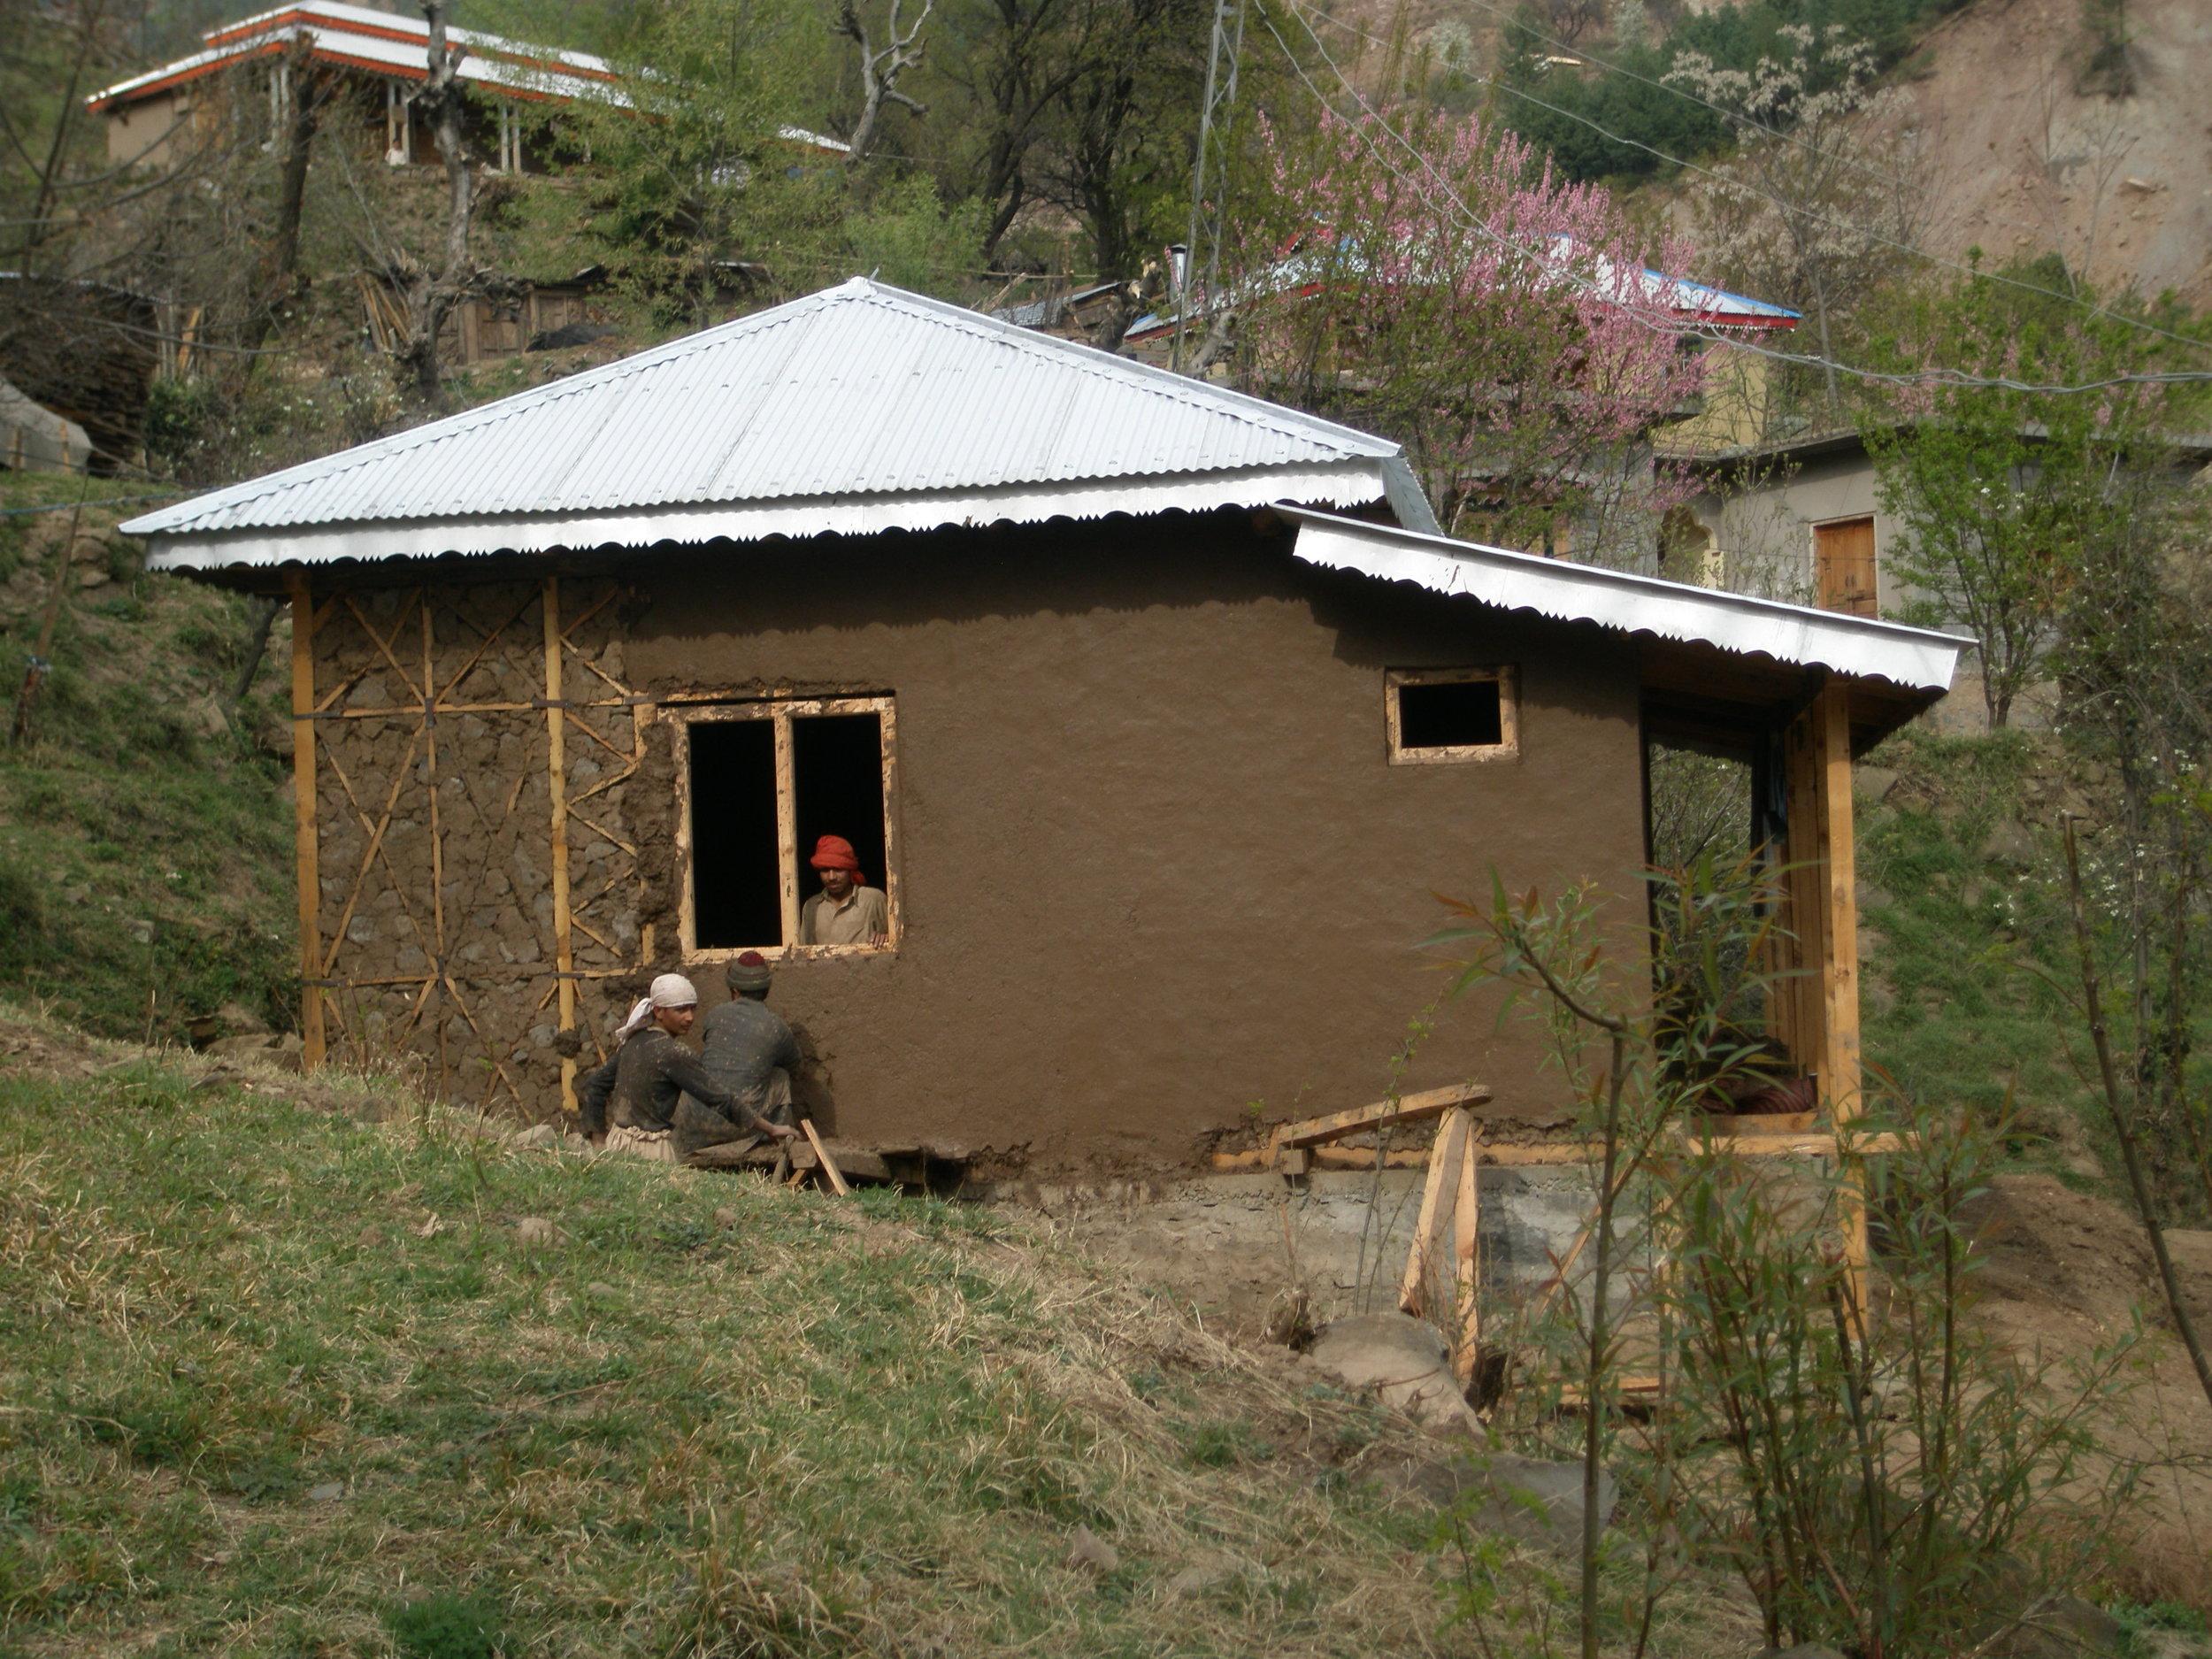 Pakistan Housing_6.jpg